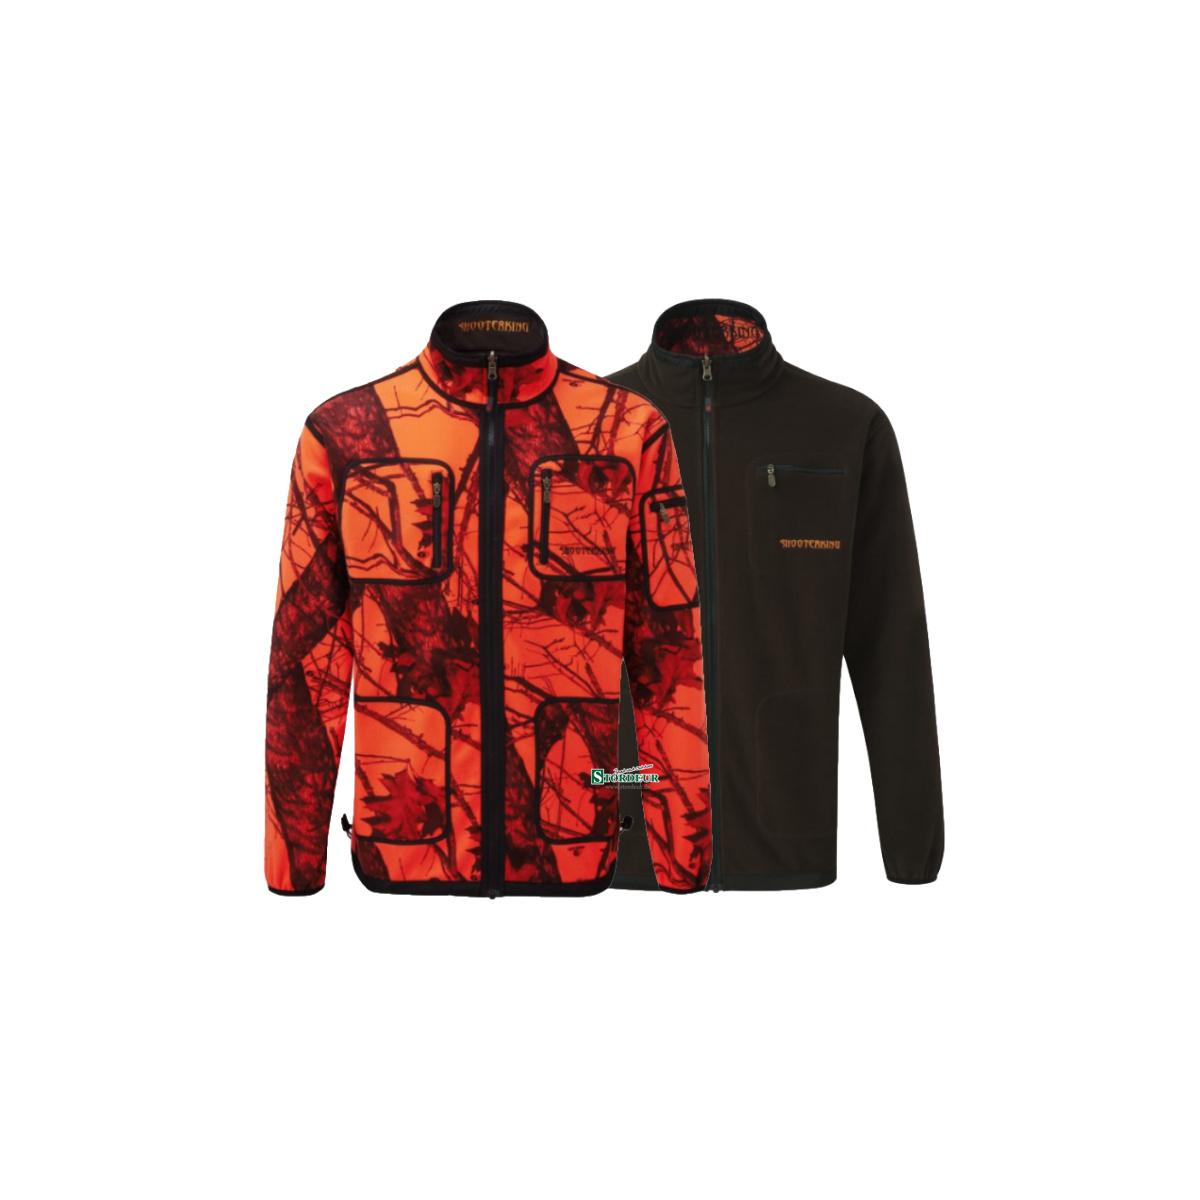 3f4aa793842c86 SHOOTERKING - Softshell Herren Jacke 2 in 1 Mossy Blaze Orange, 129,0